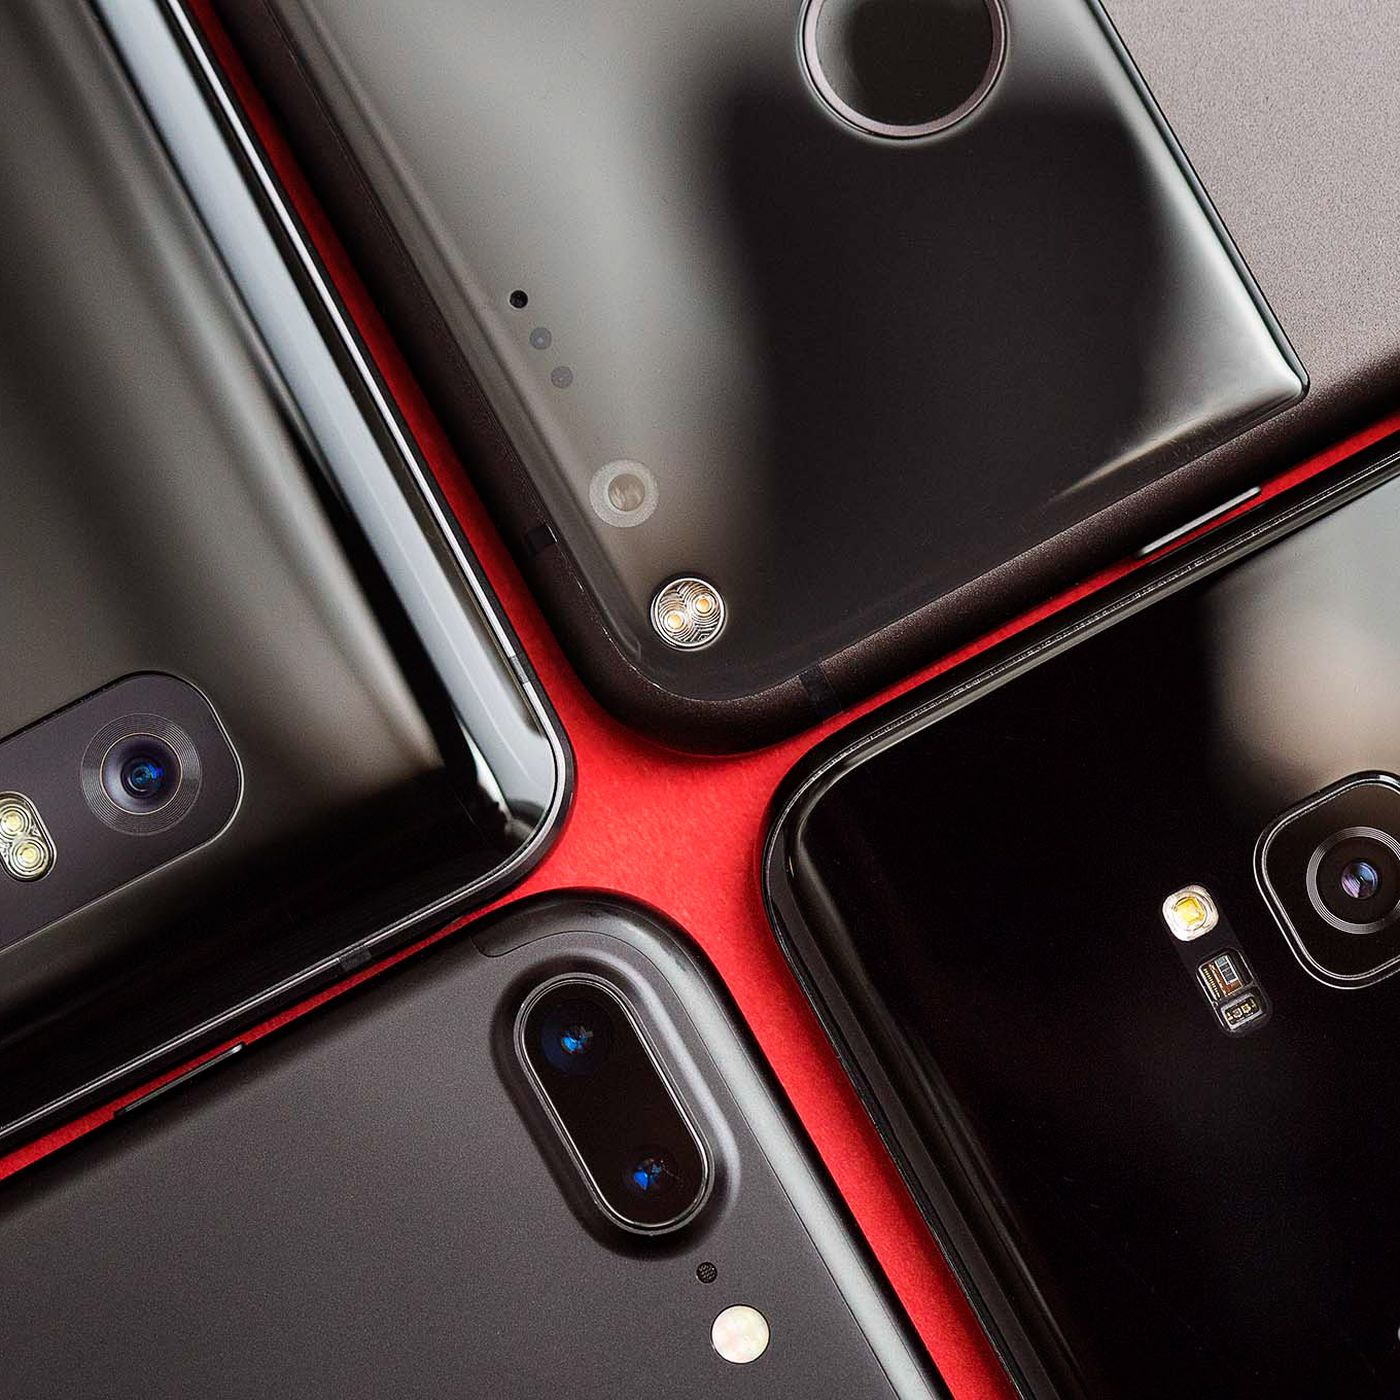 Smartphone camera shootout Galaxy S8 vs iPhone 7 Google Pixel